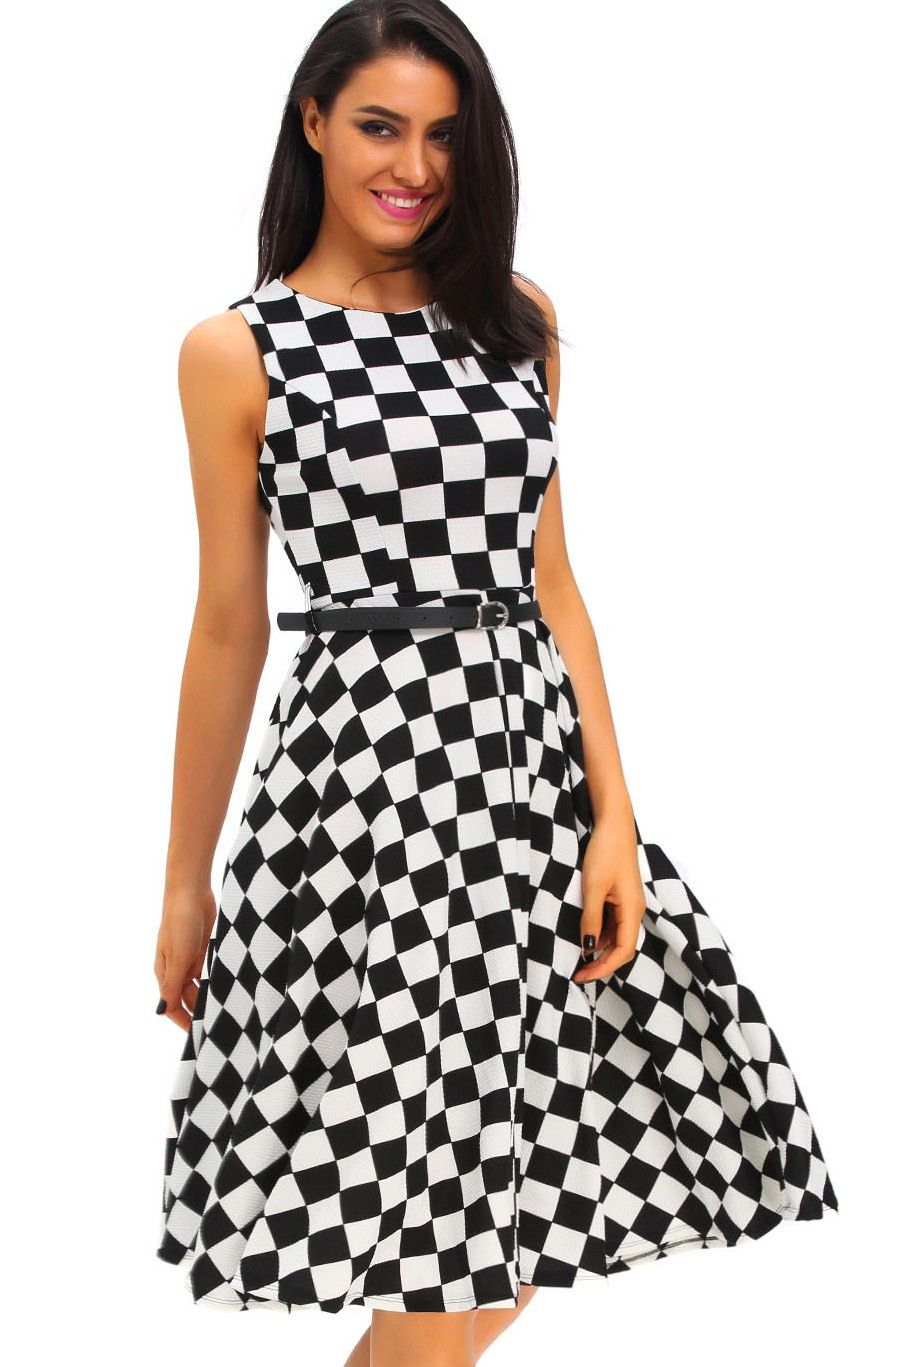 Vintage Année 50 dedans robe retro vintage annee 50 blanc noir tartan swing elegante